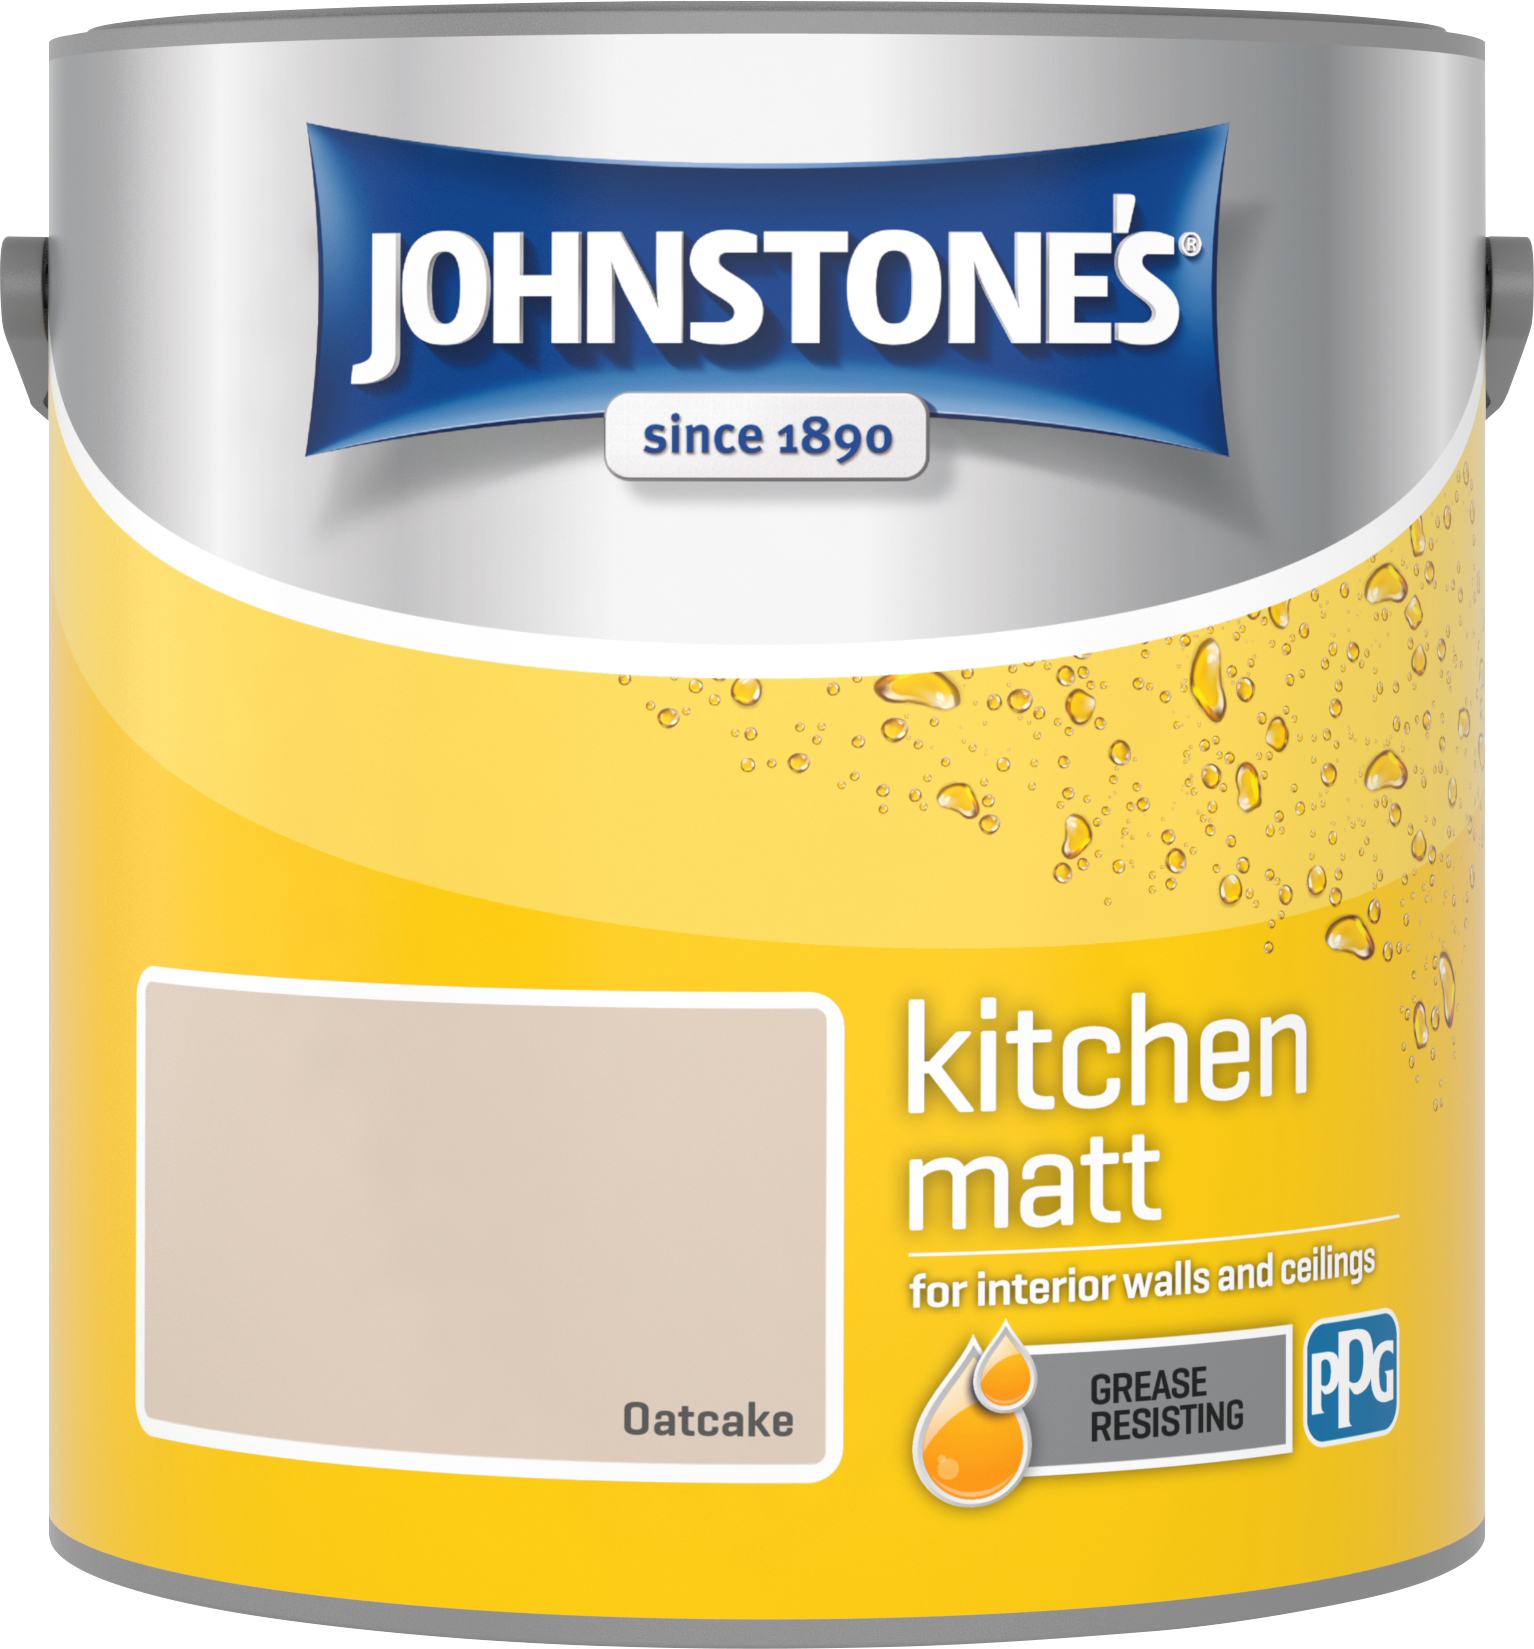 Johnstone's 2.5 Litre Kitchen Paint - Oatcake